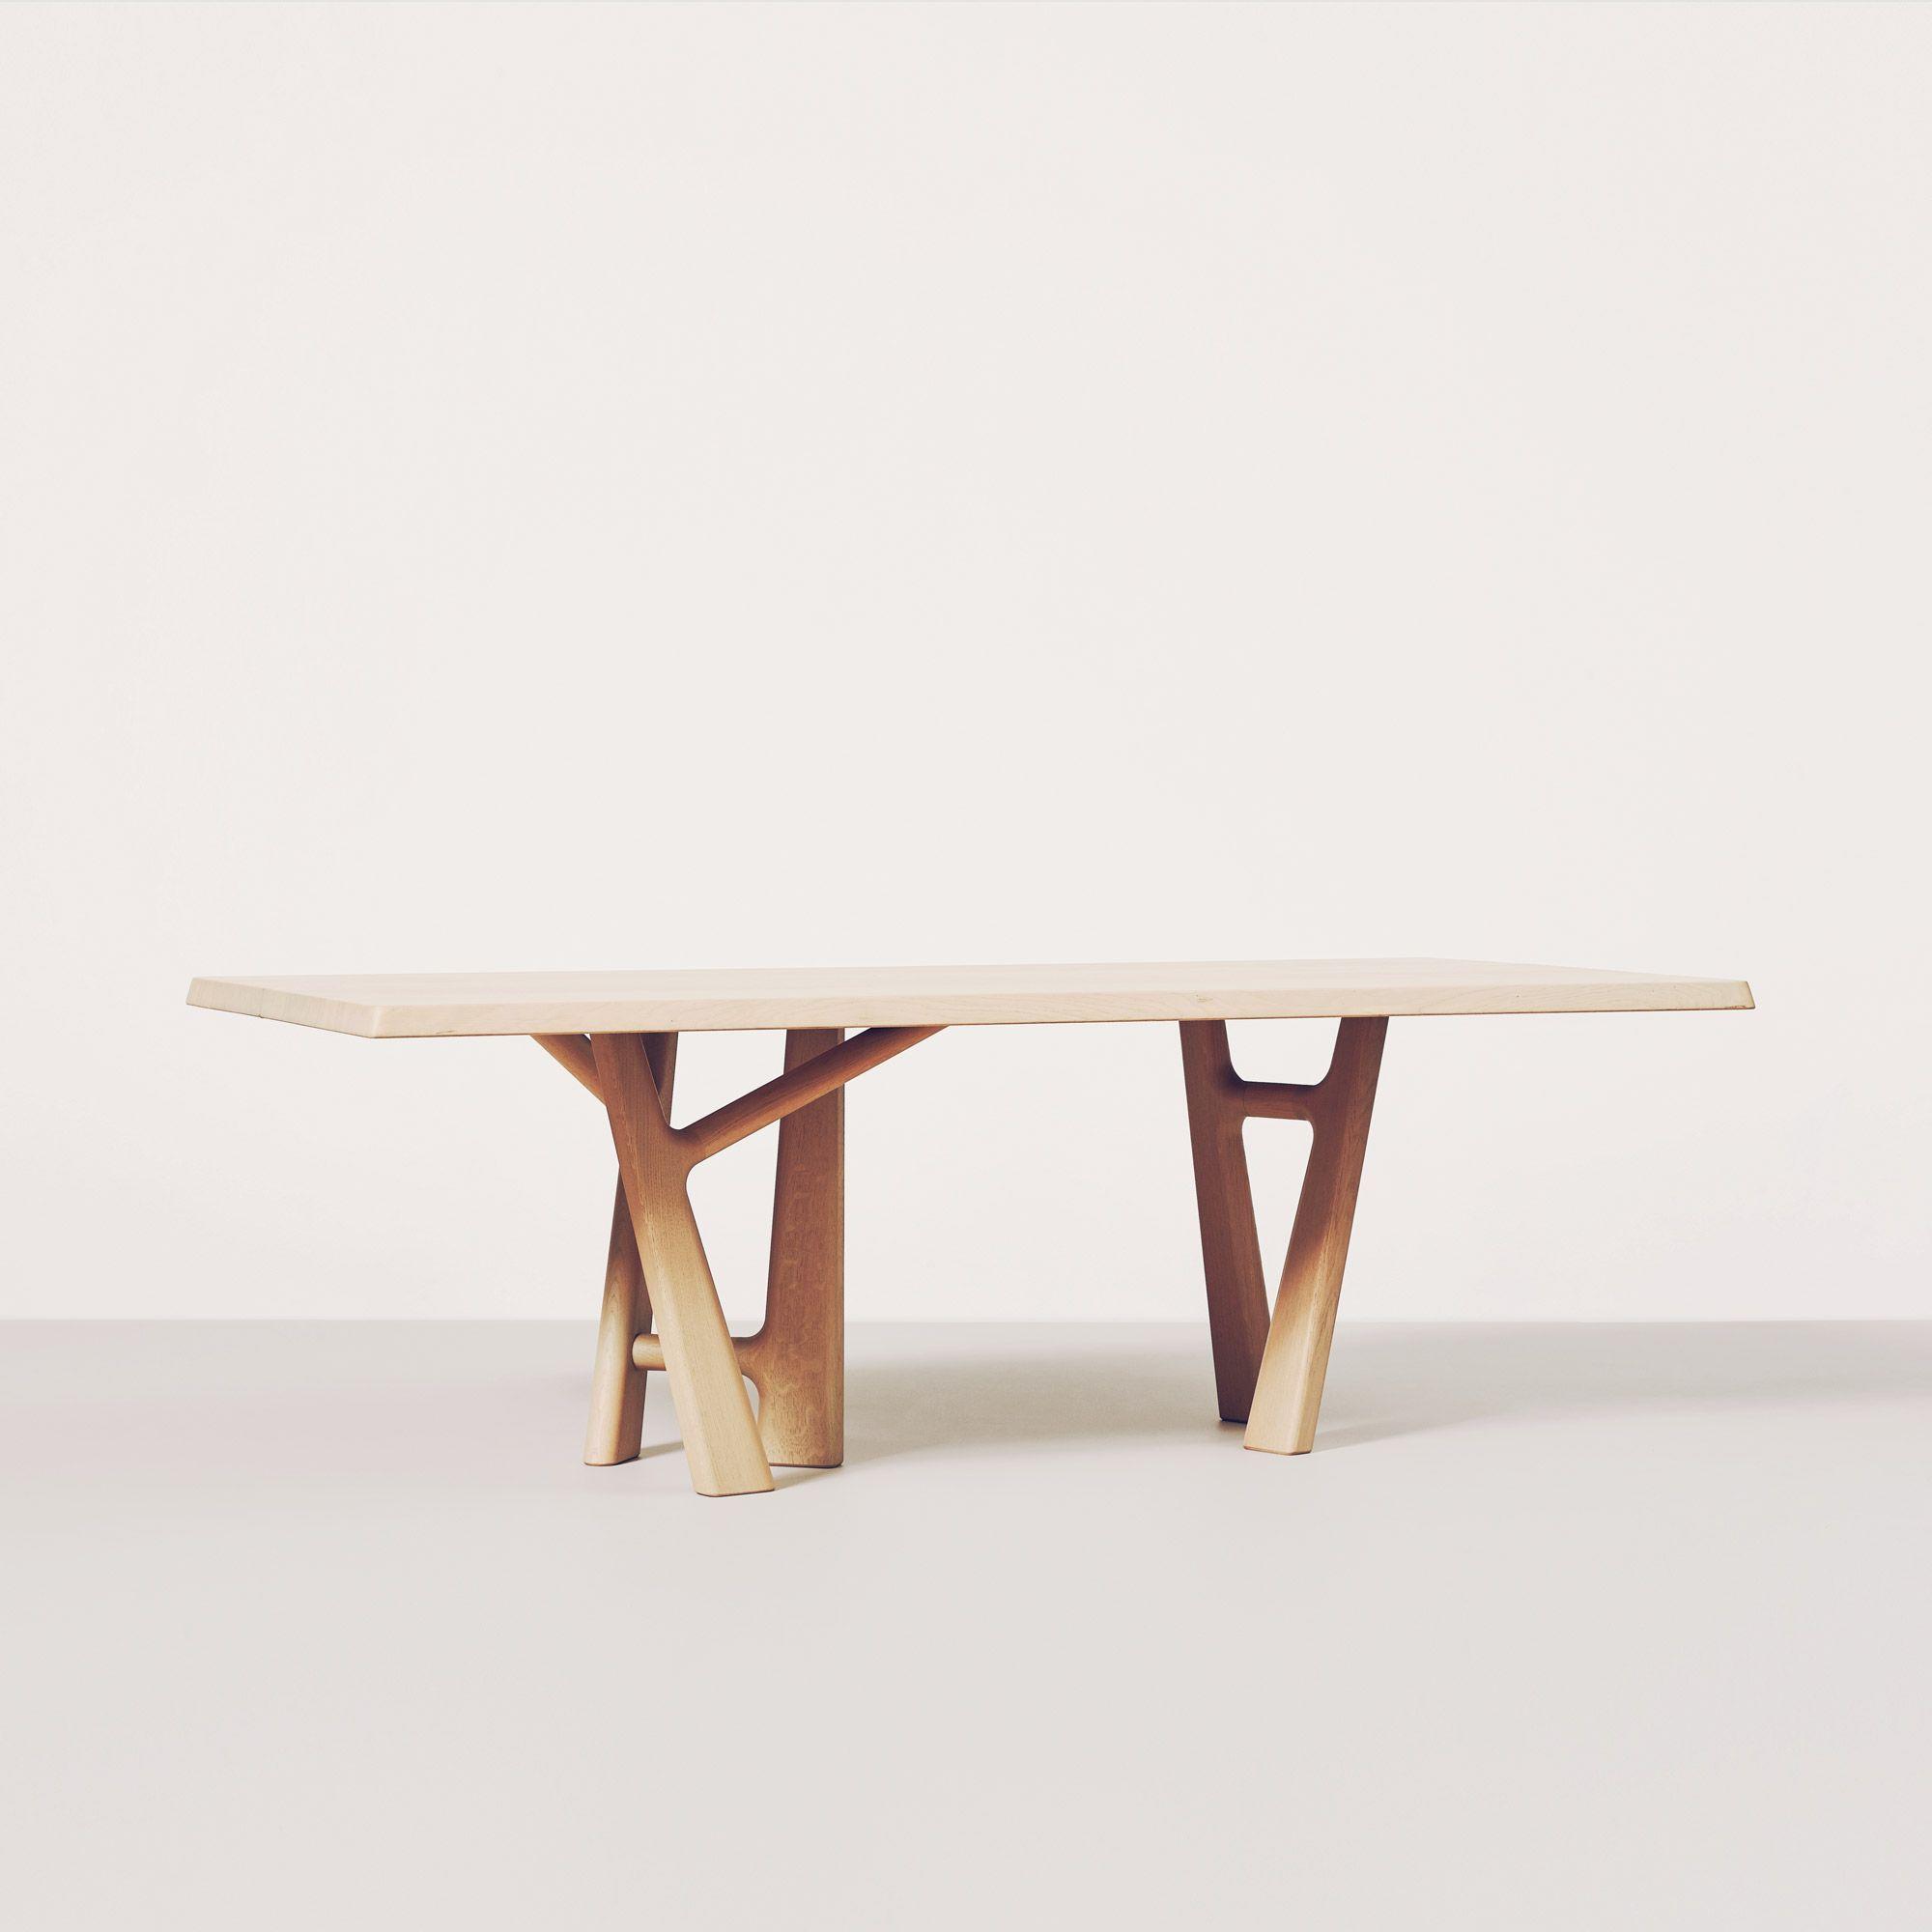 2edbe9cebc56489714d44a7b7cd42807 Incroyable De Pied Table Basse Inox Schème